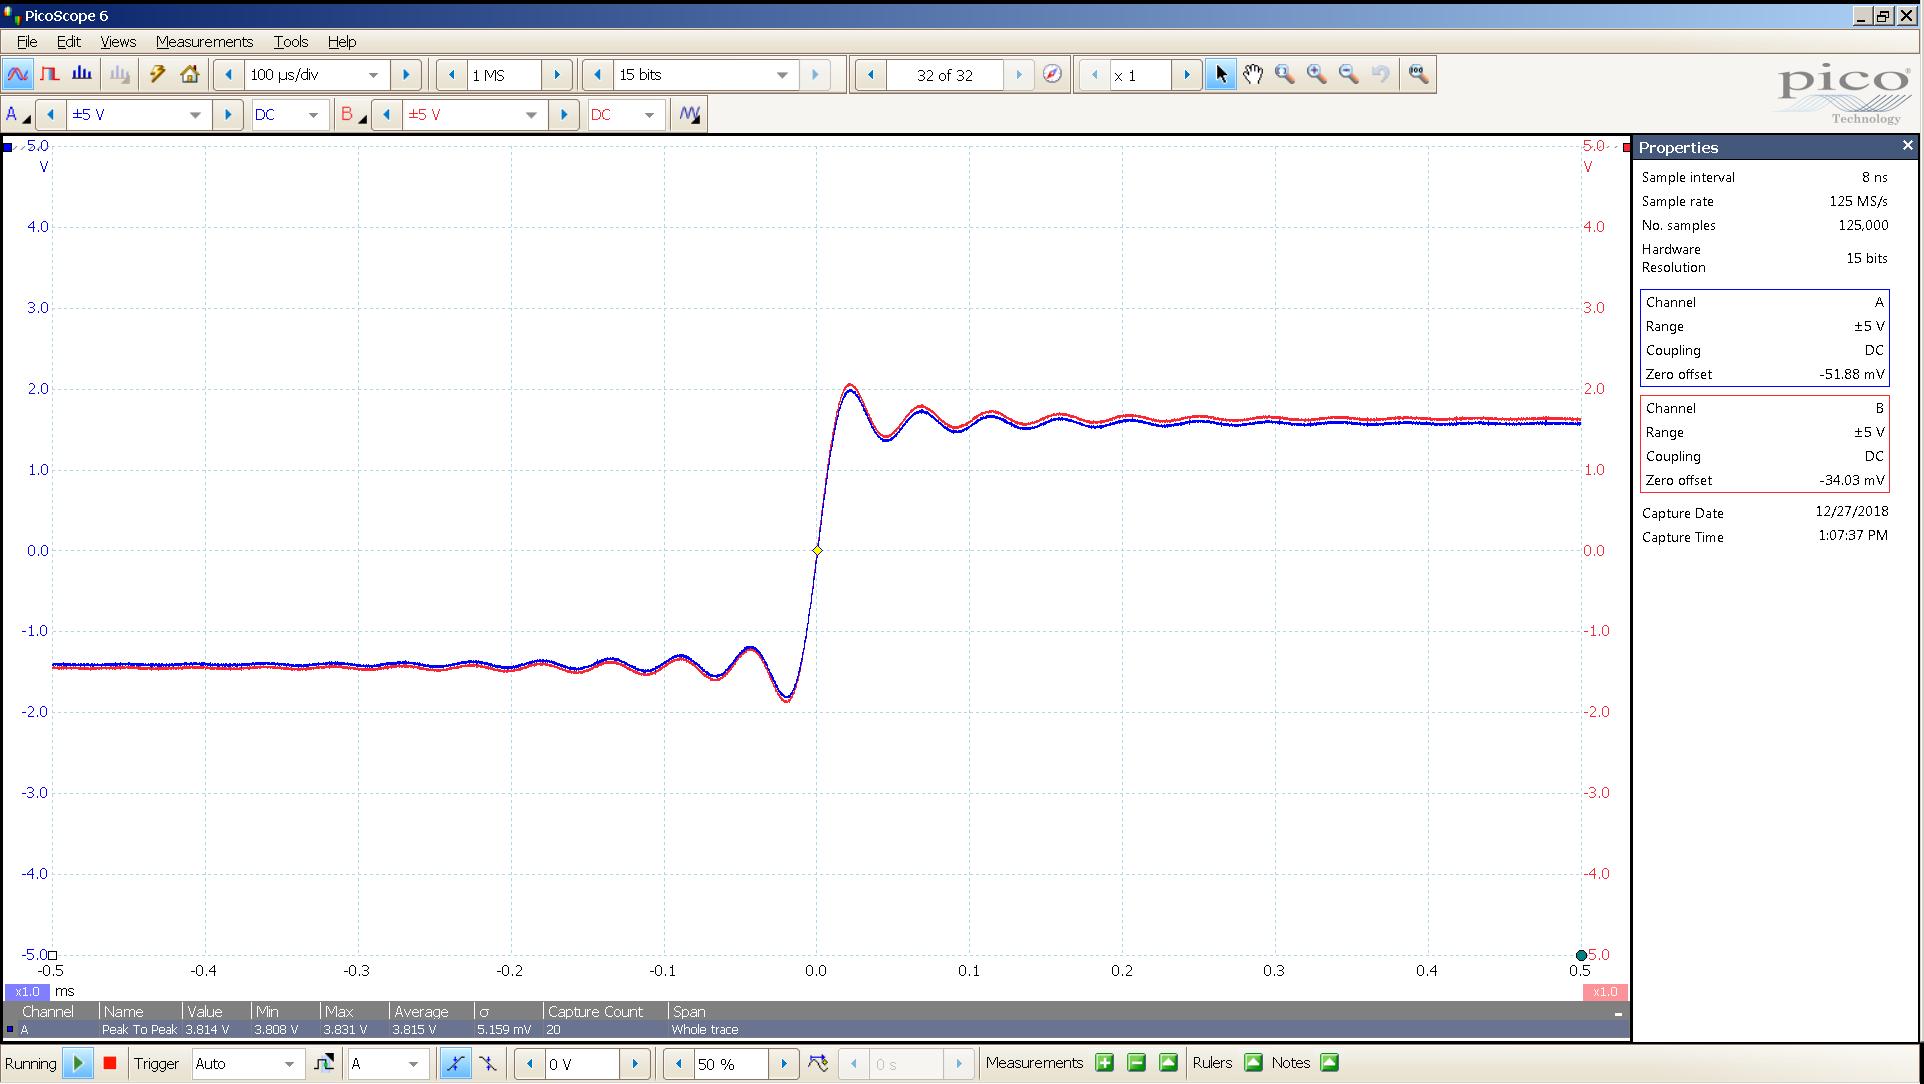 20181227-22 convert2 Bal 20 Hz sqr 0 dBFS 4 Vpp 100uS div - USB.PNG